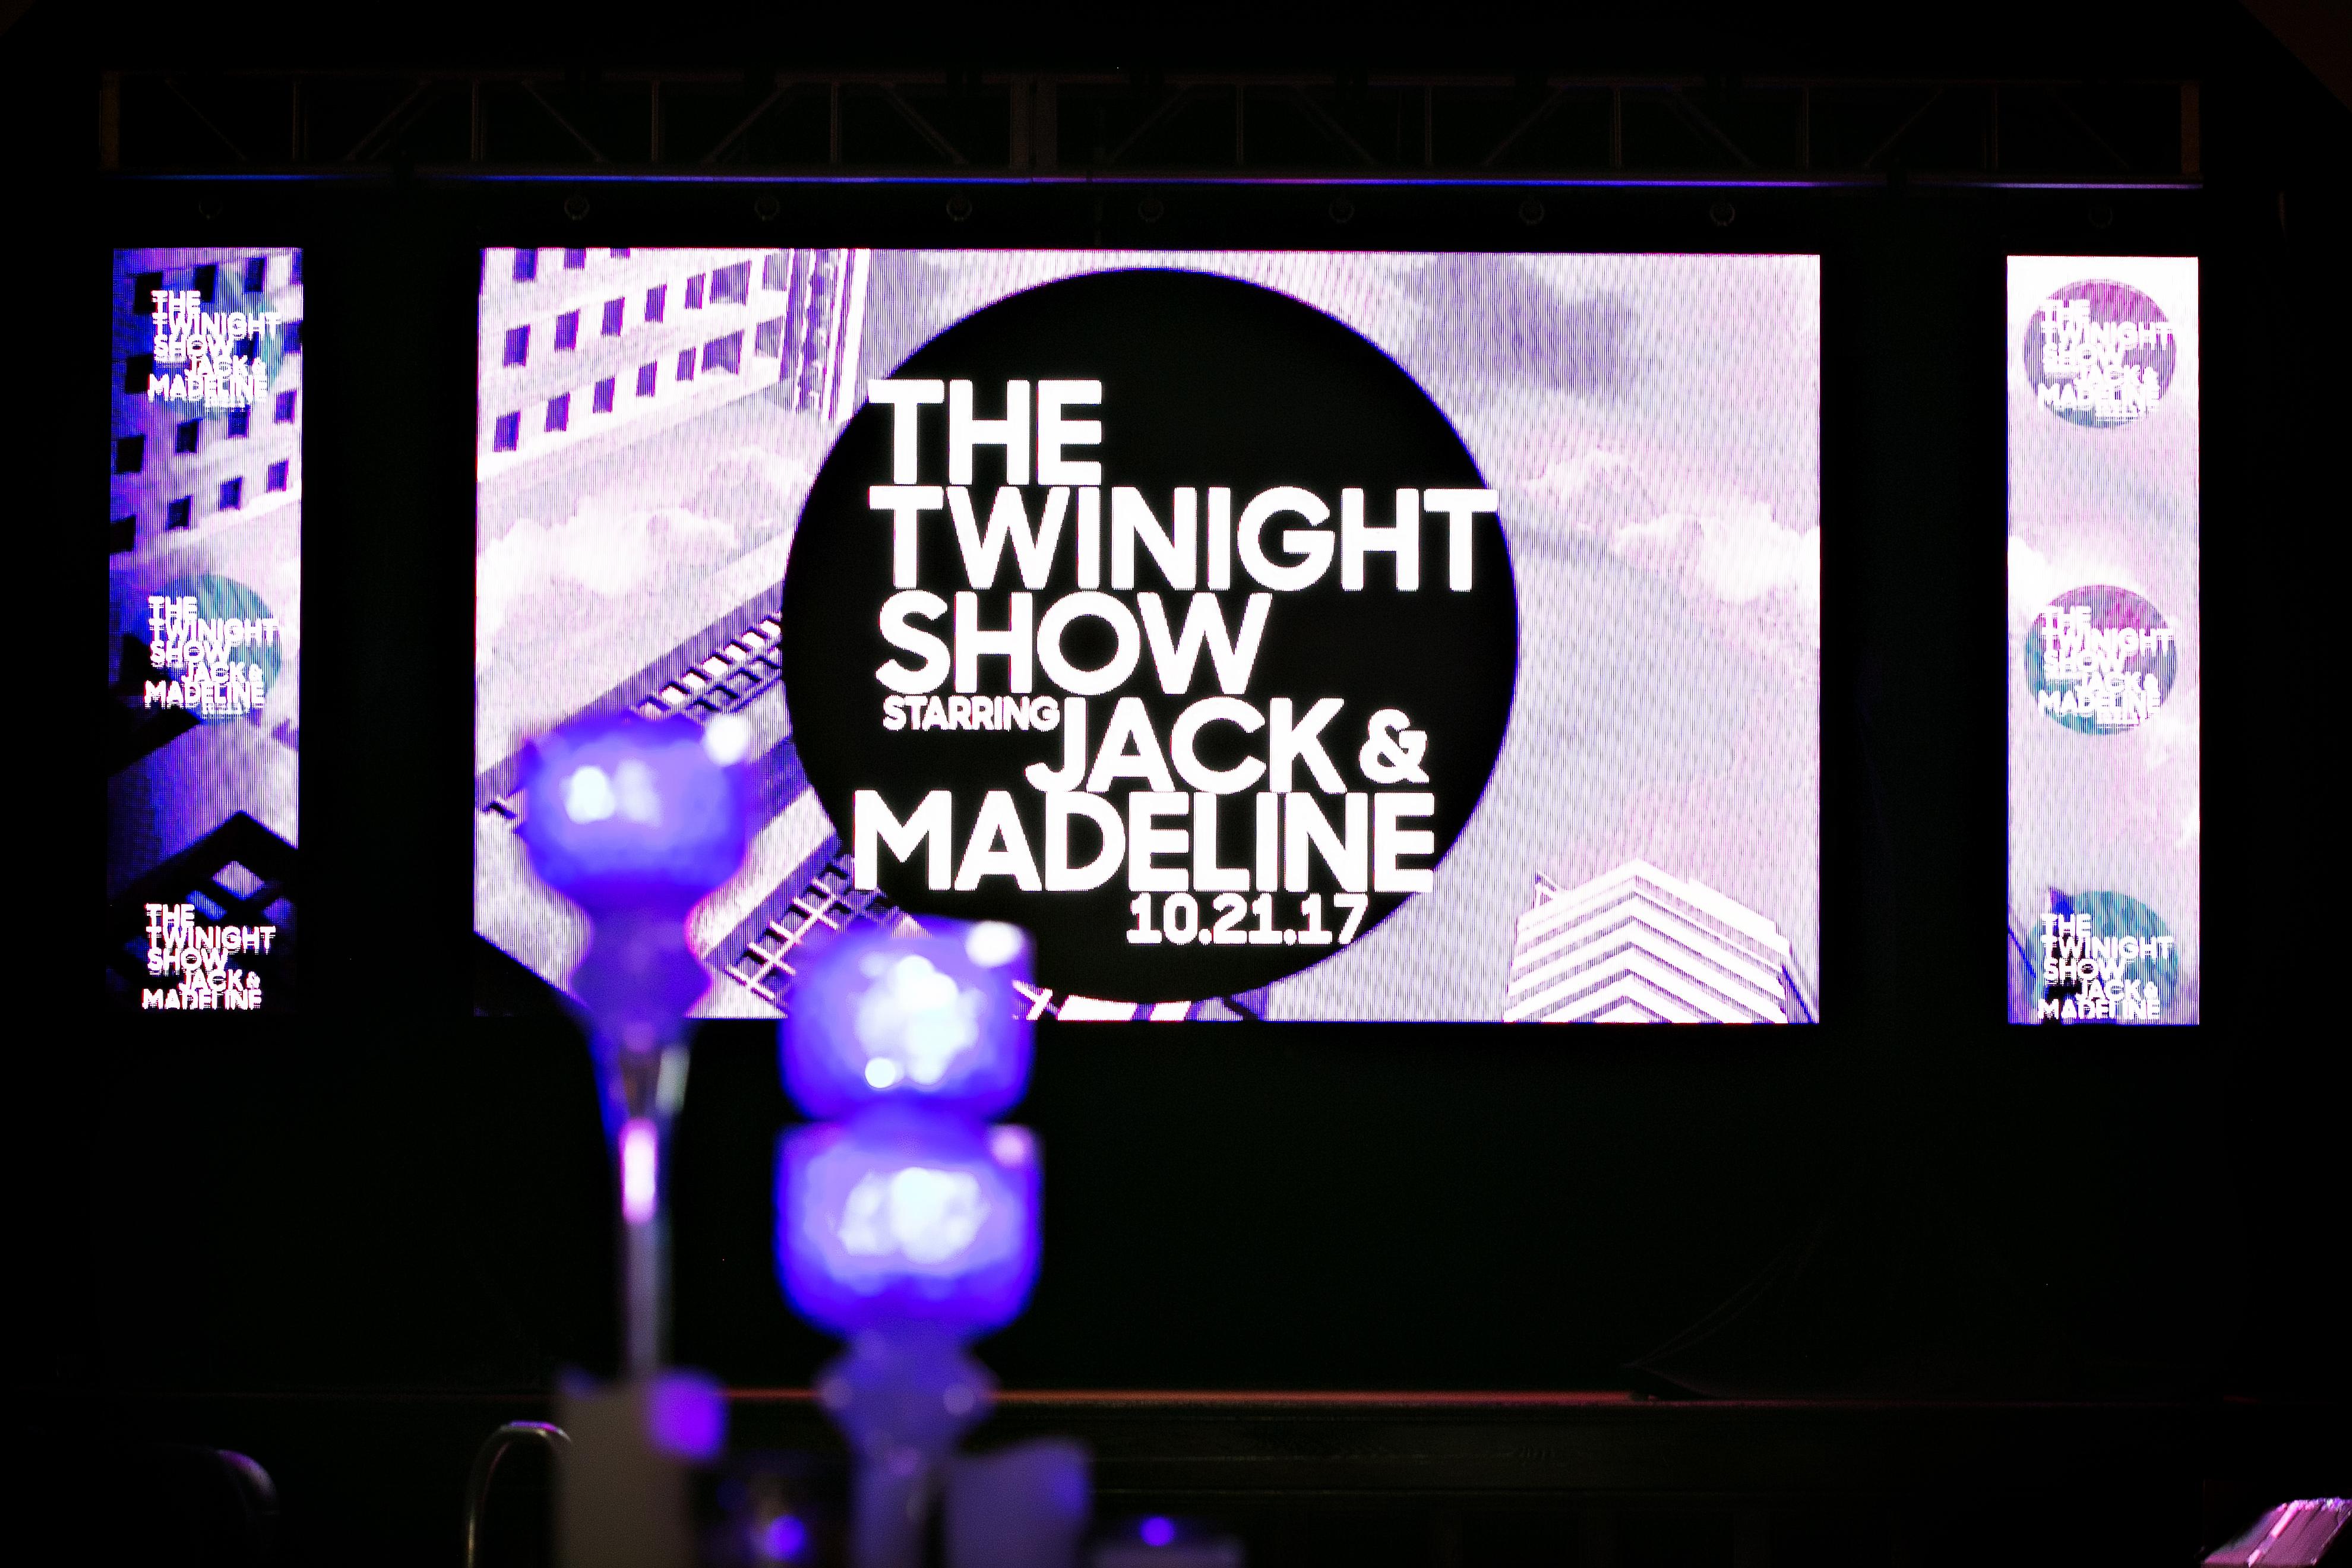 The Twinnight Show B'nai Mitzvah - Elaine Klein Events